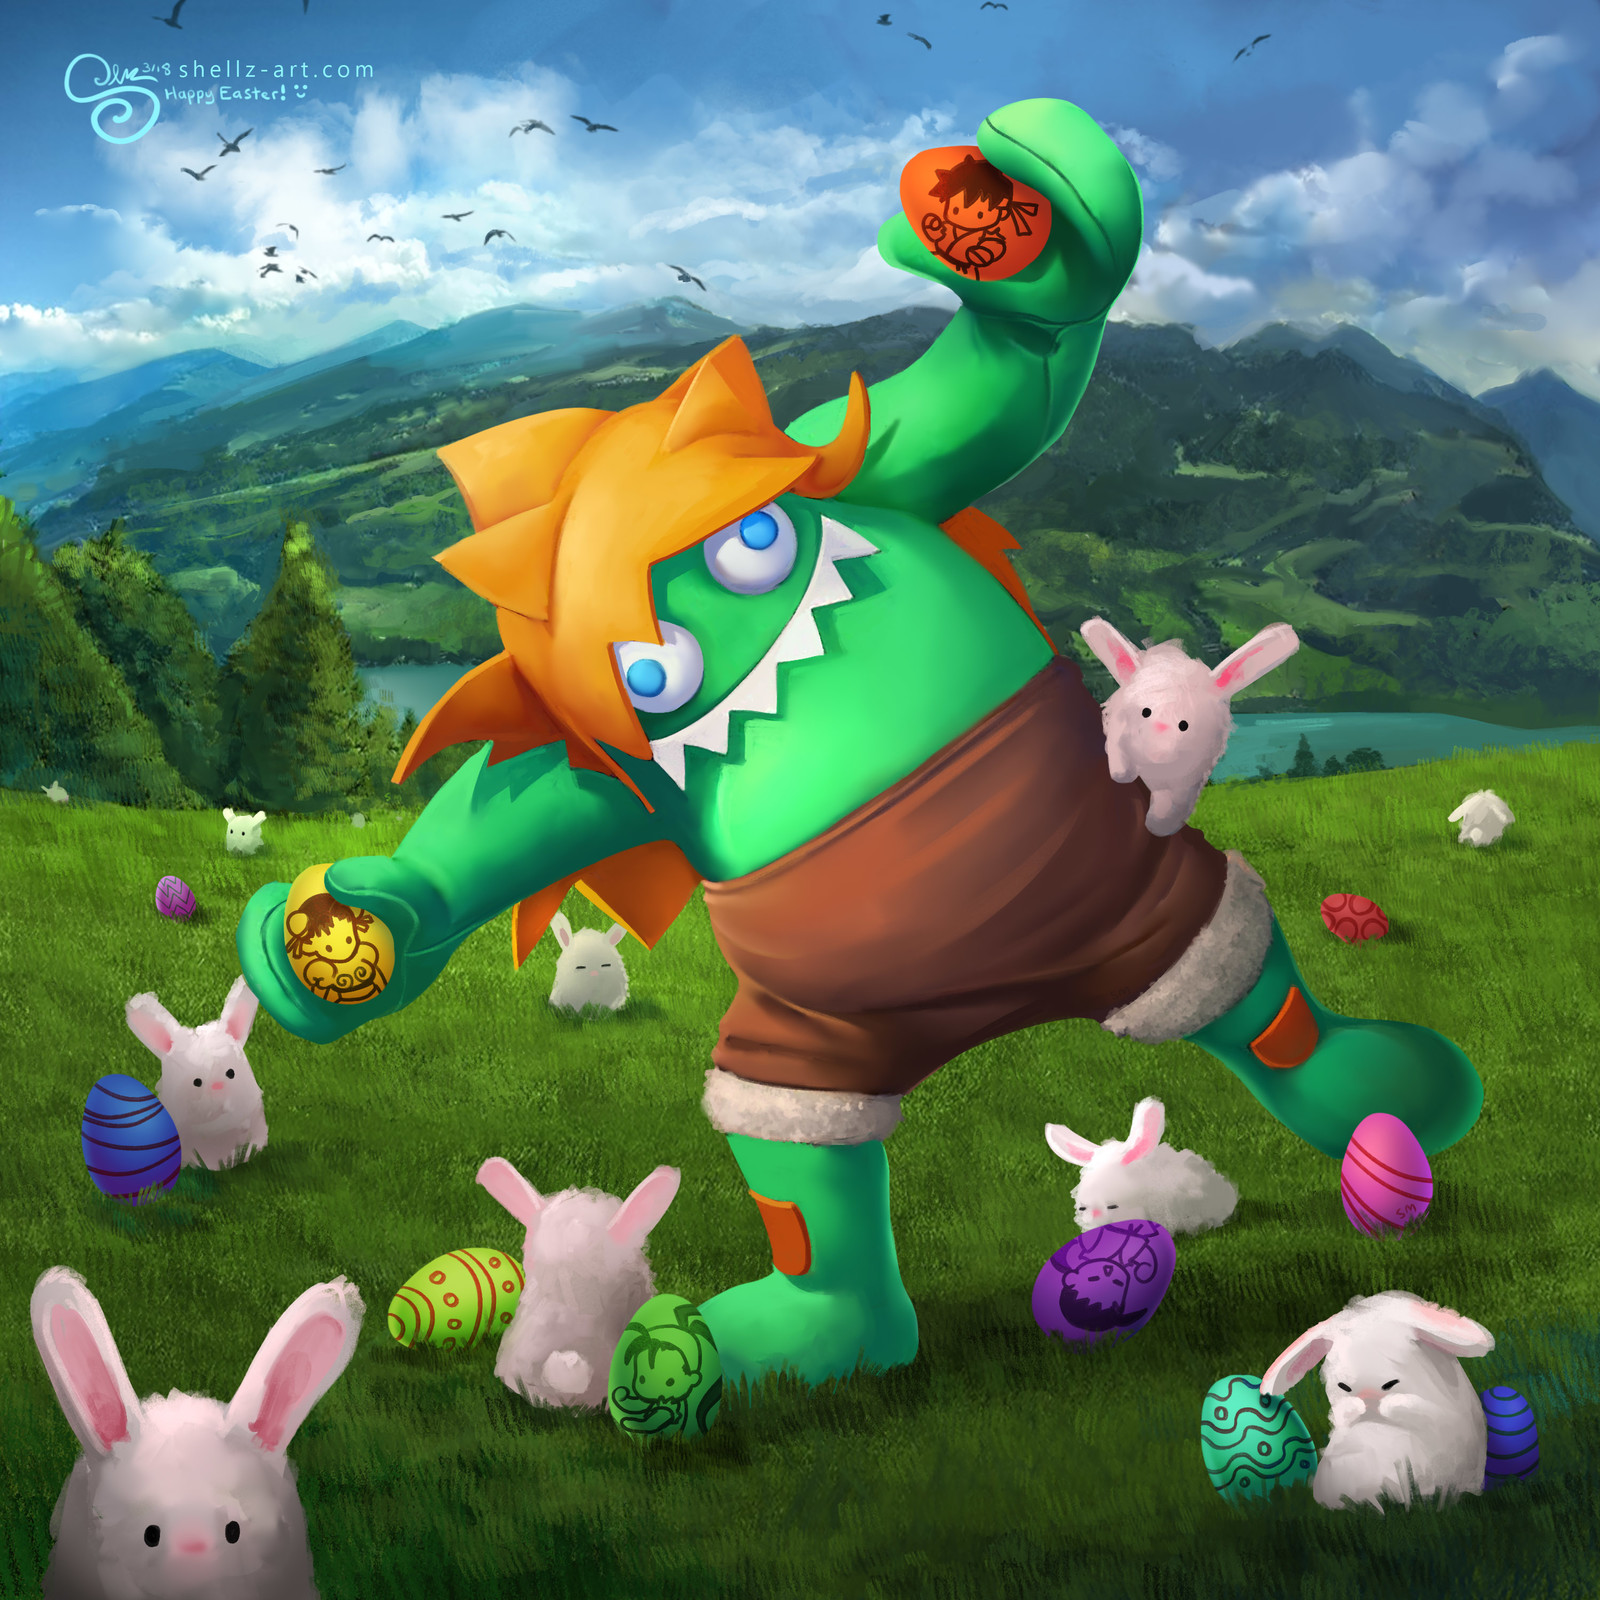 Blanka-Chan's Easter